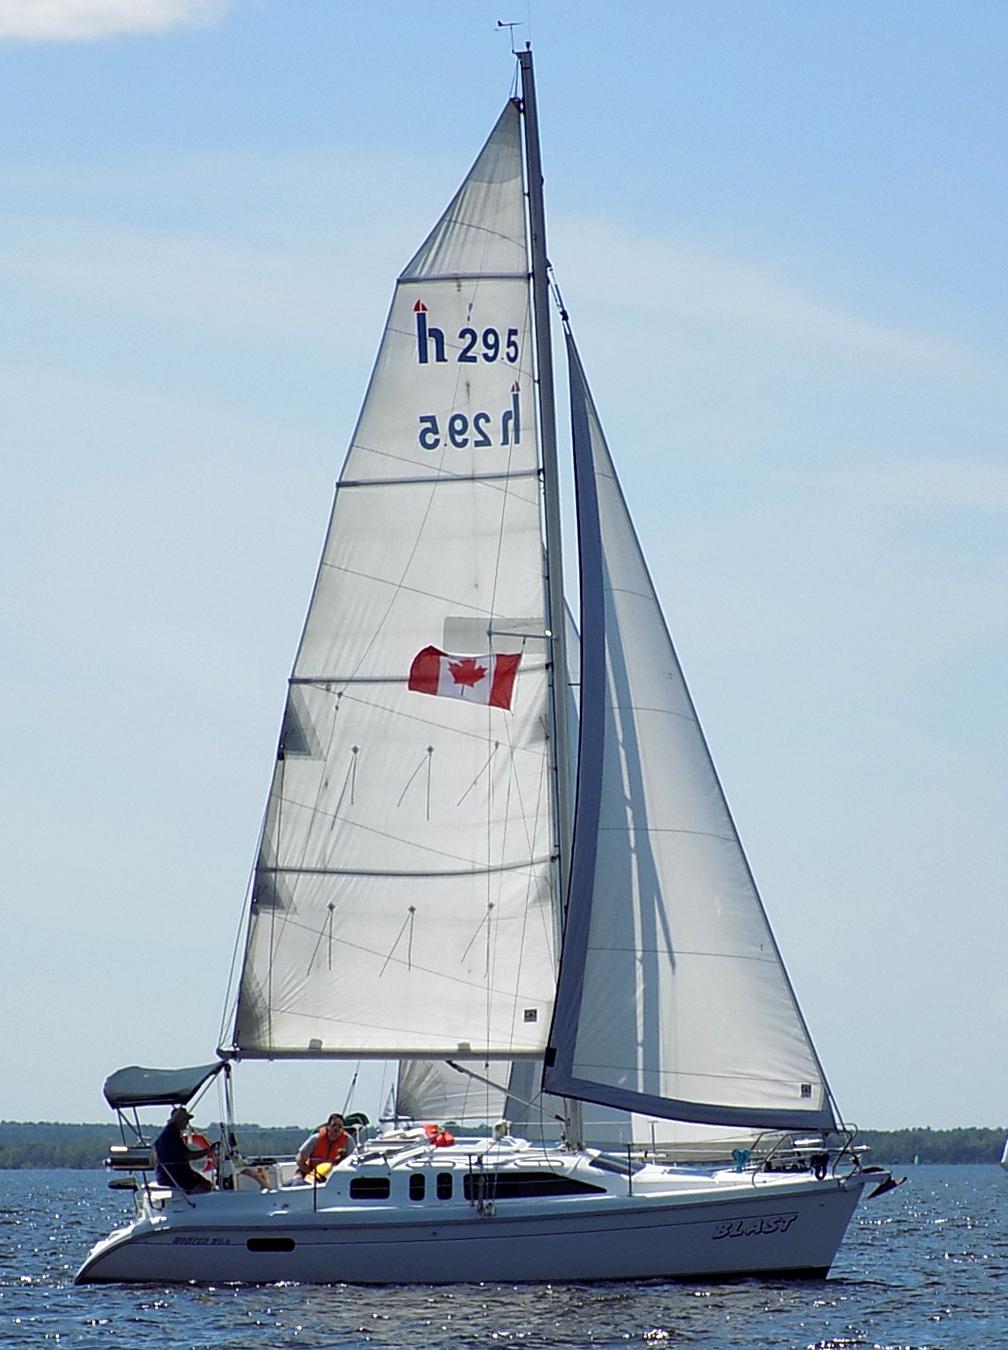 Hunter 29.5 - Wikipedia